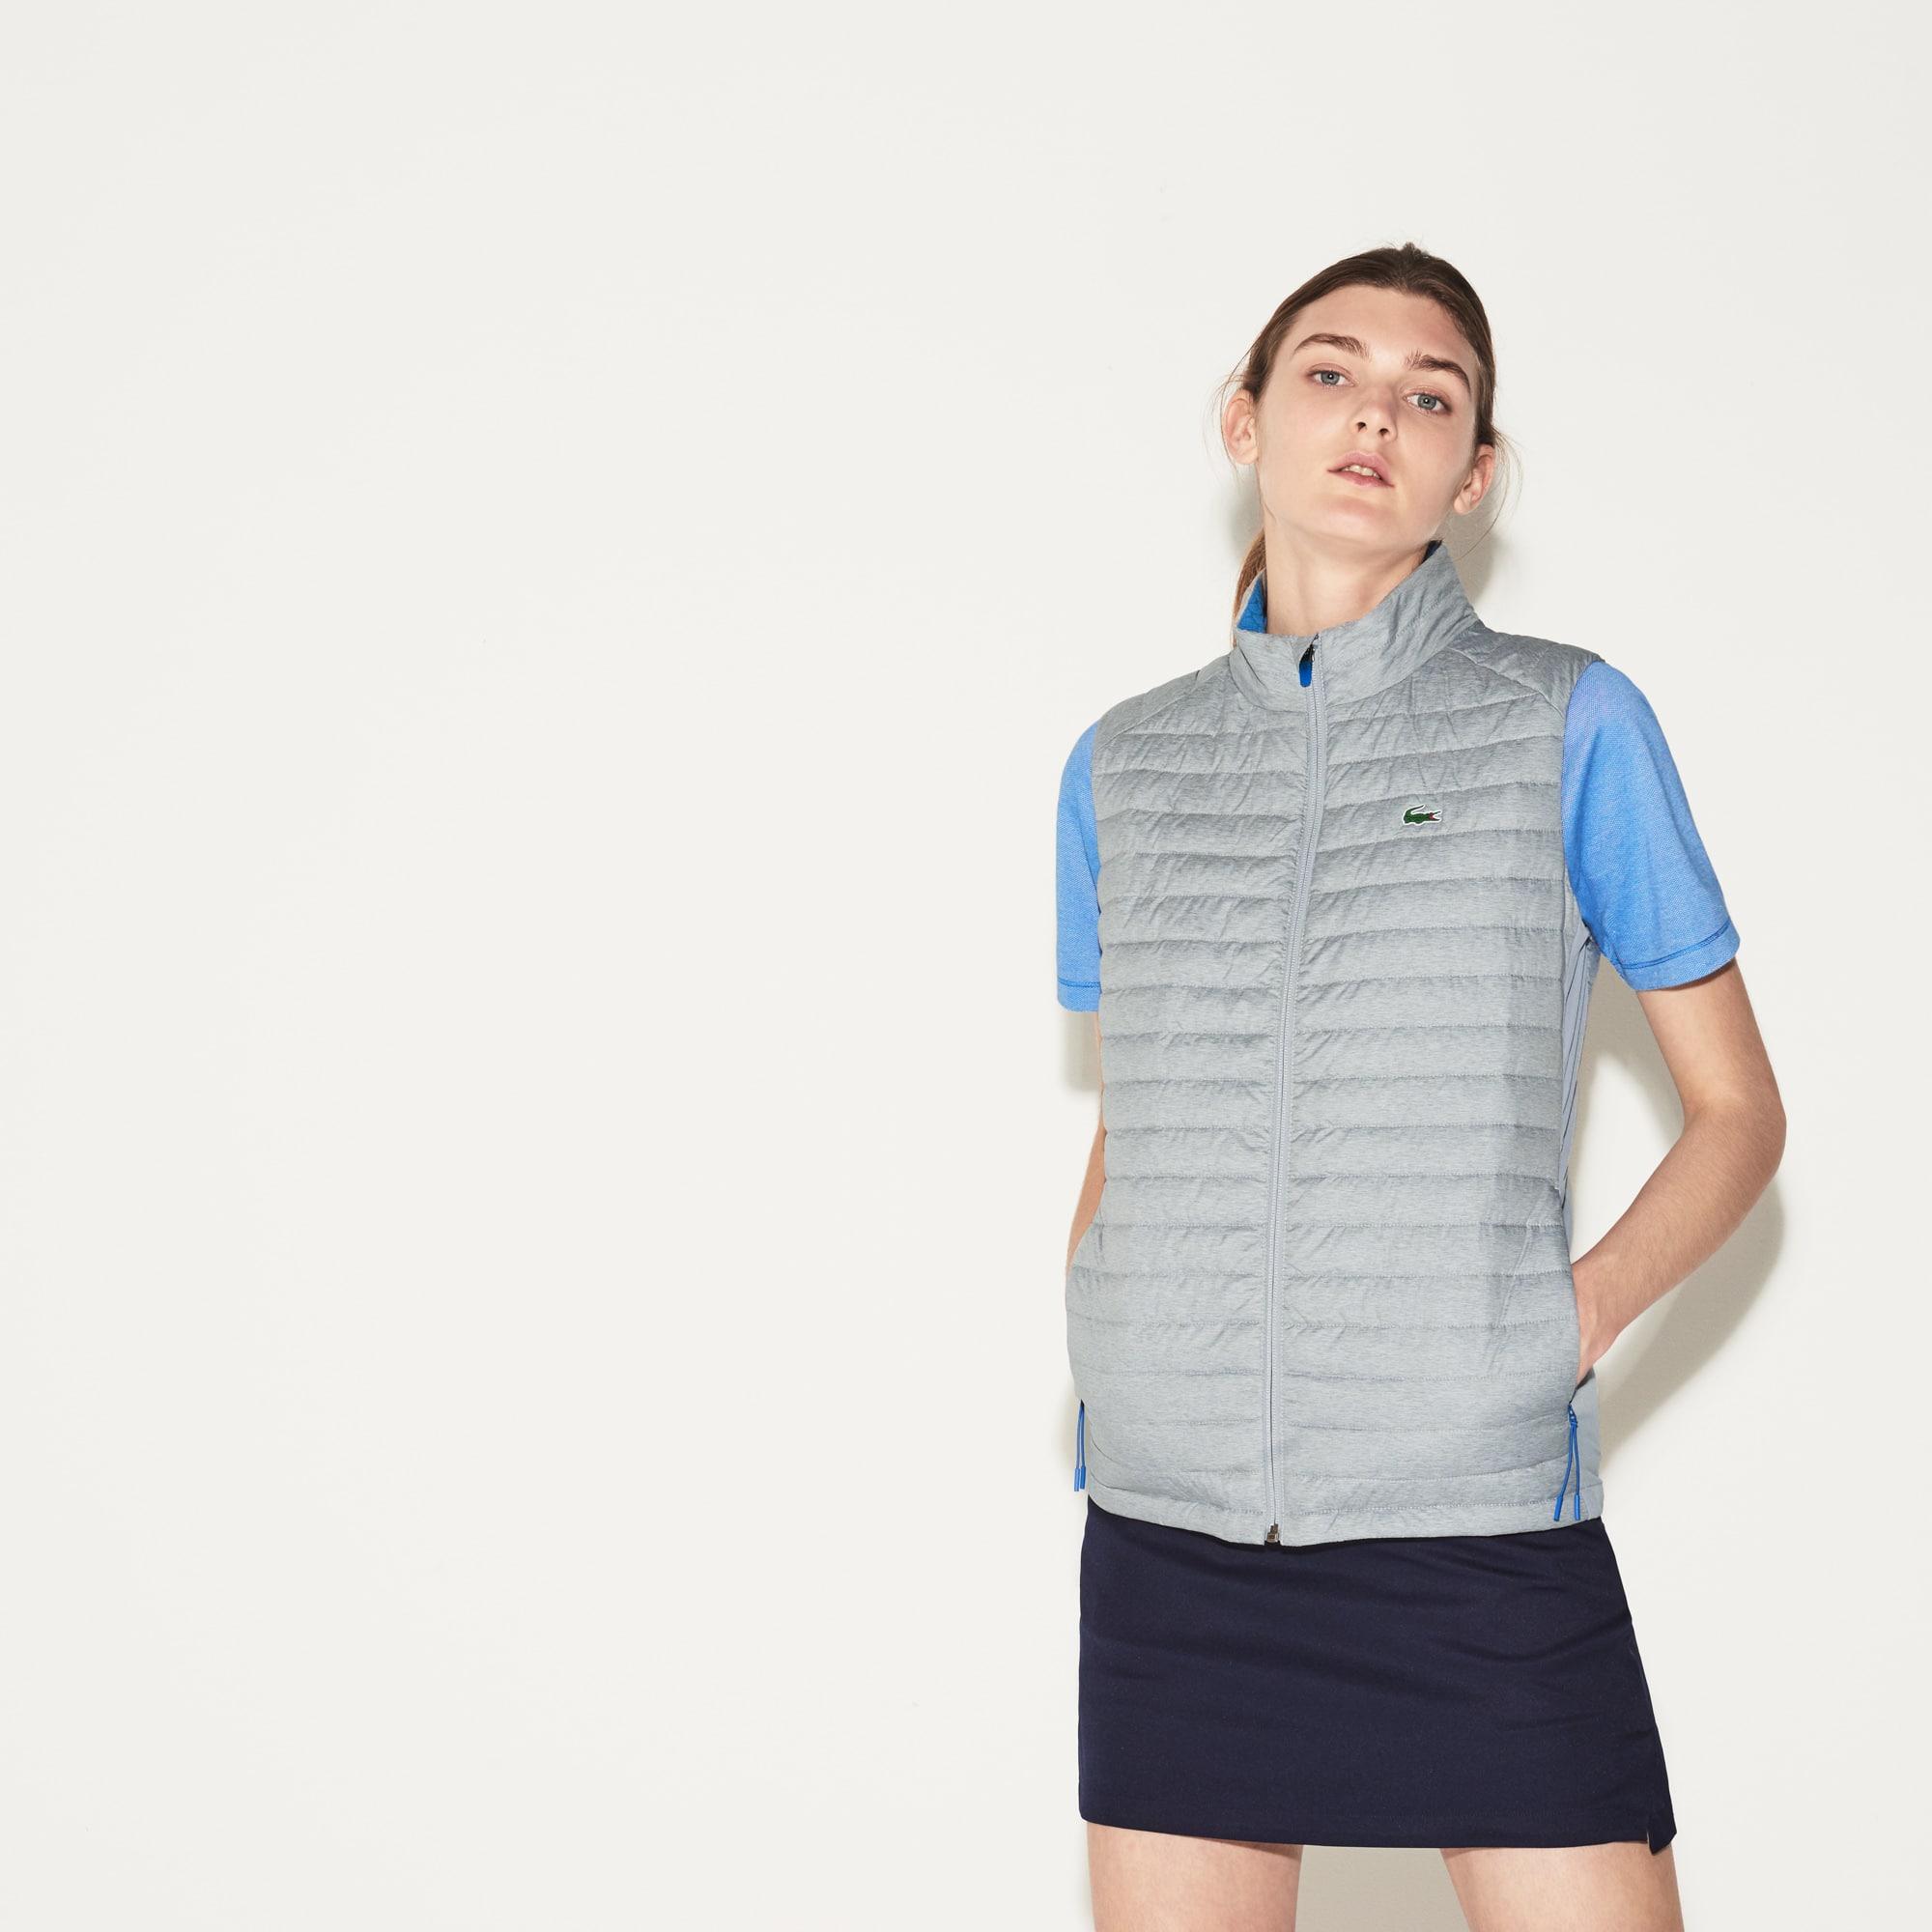 Women's Lacoste SPORT Technical Taffeta Golf Quilted Vest